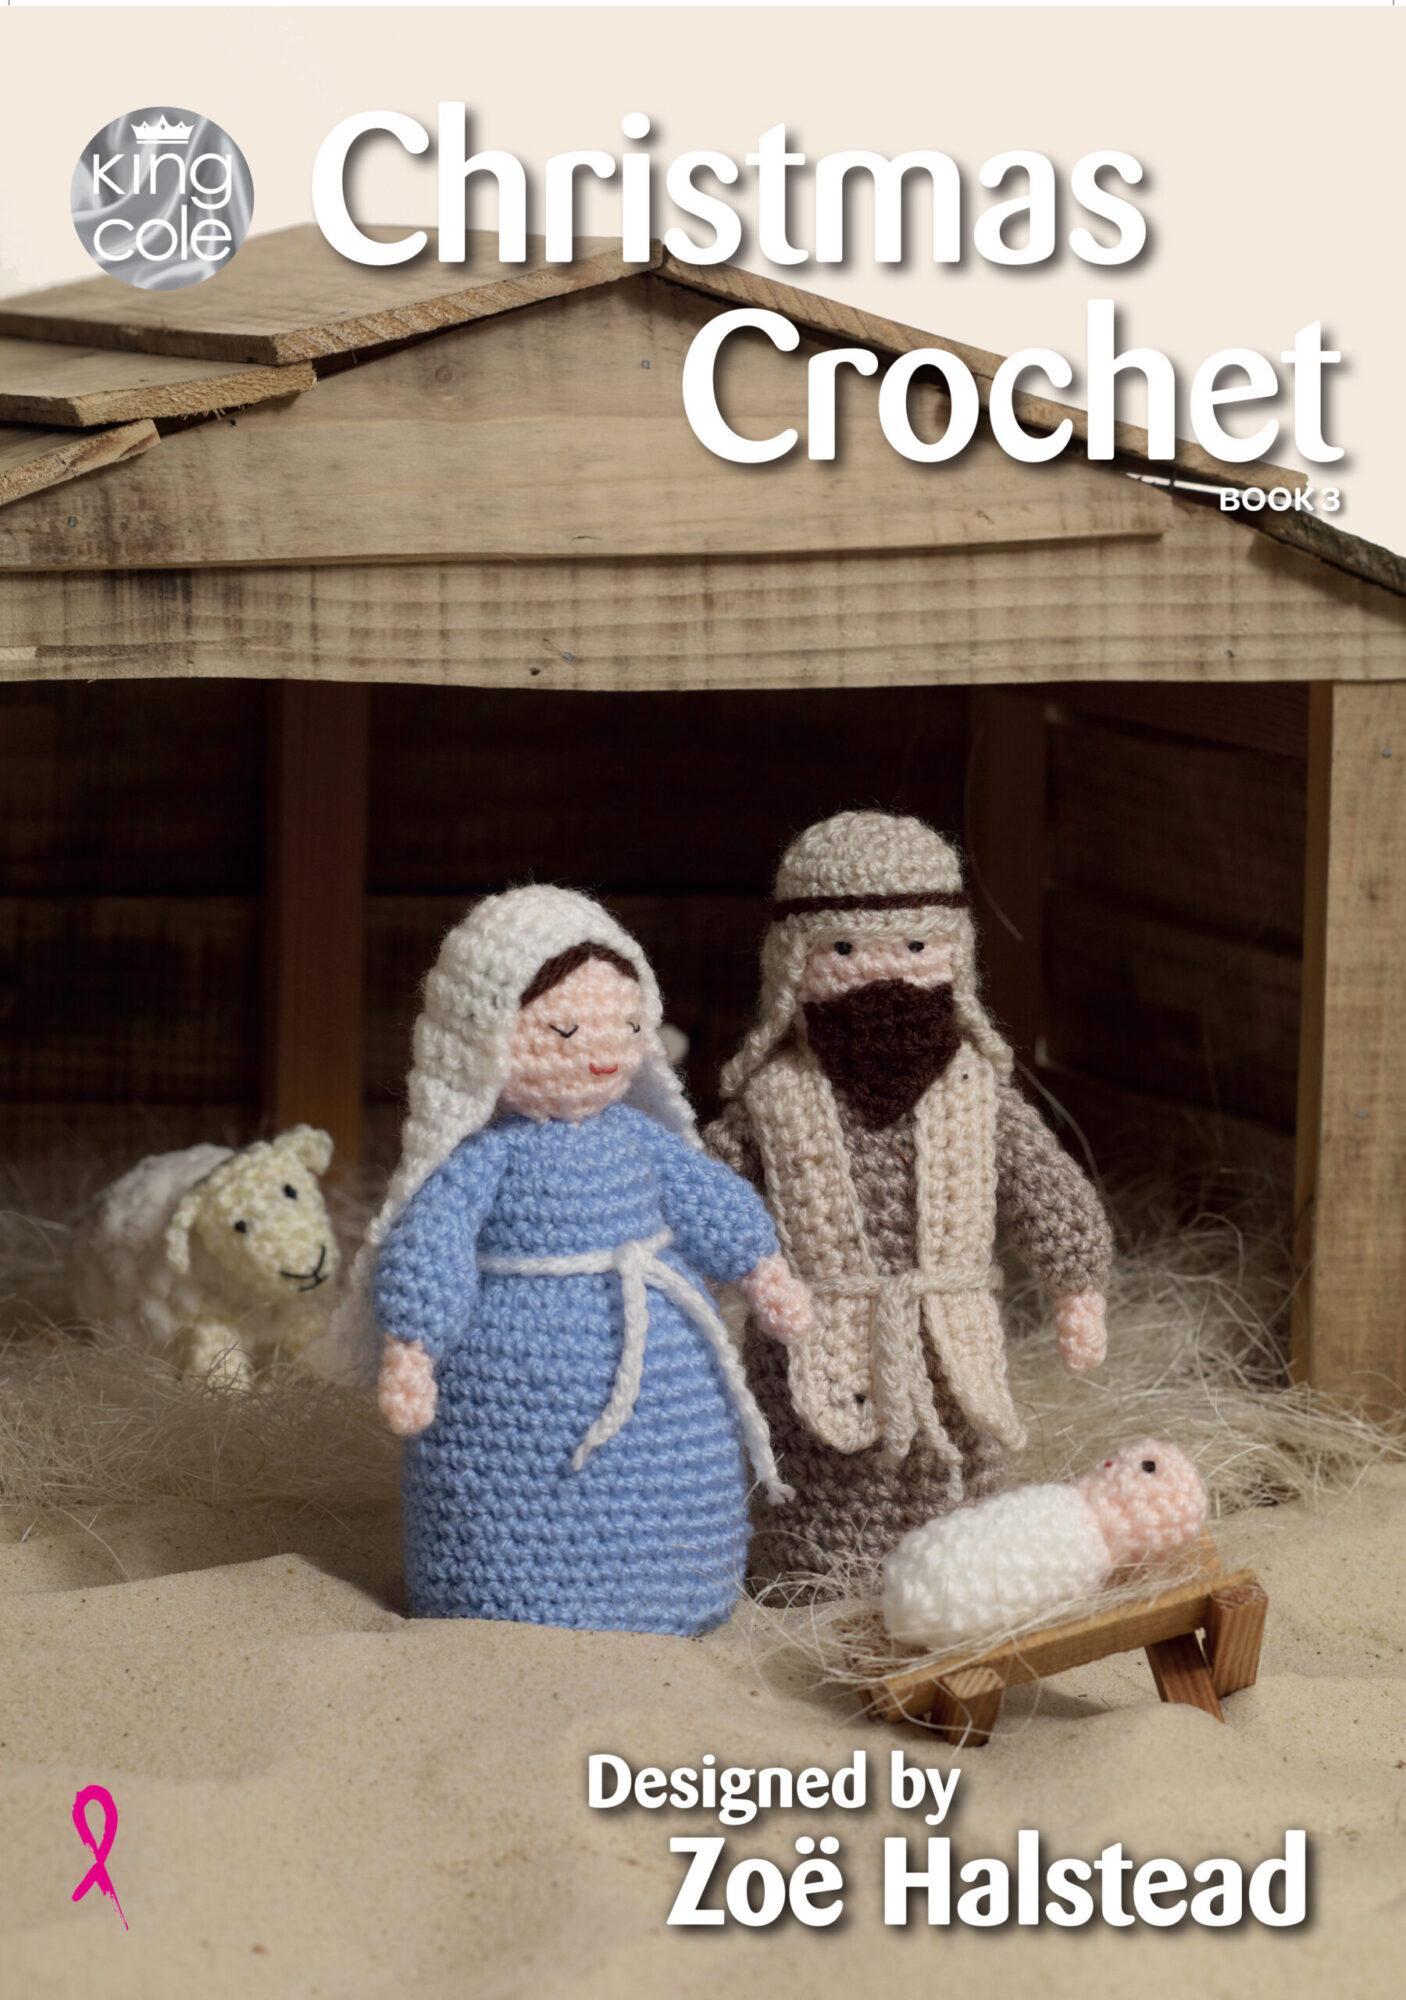 King Cole Christmas Crochet – Book 3 product image